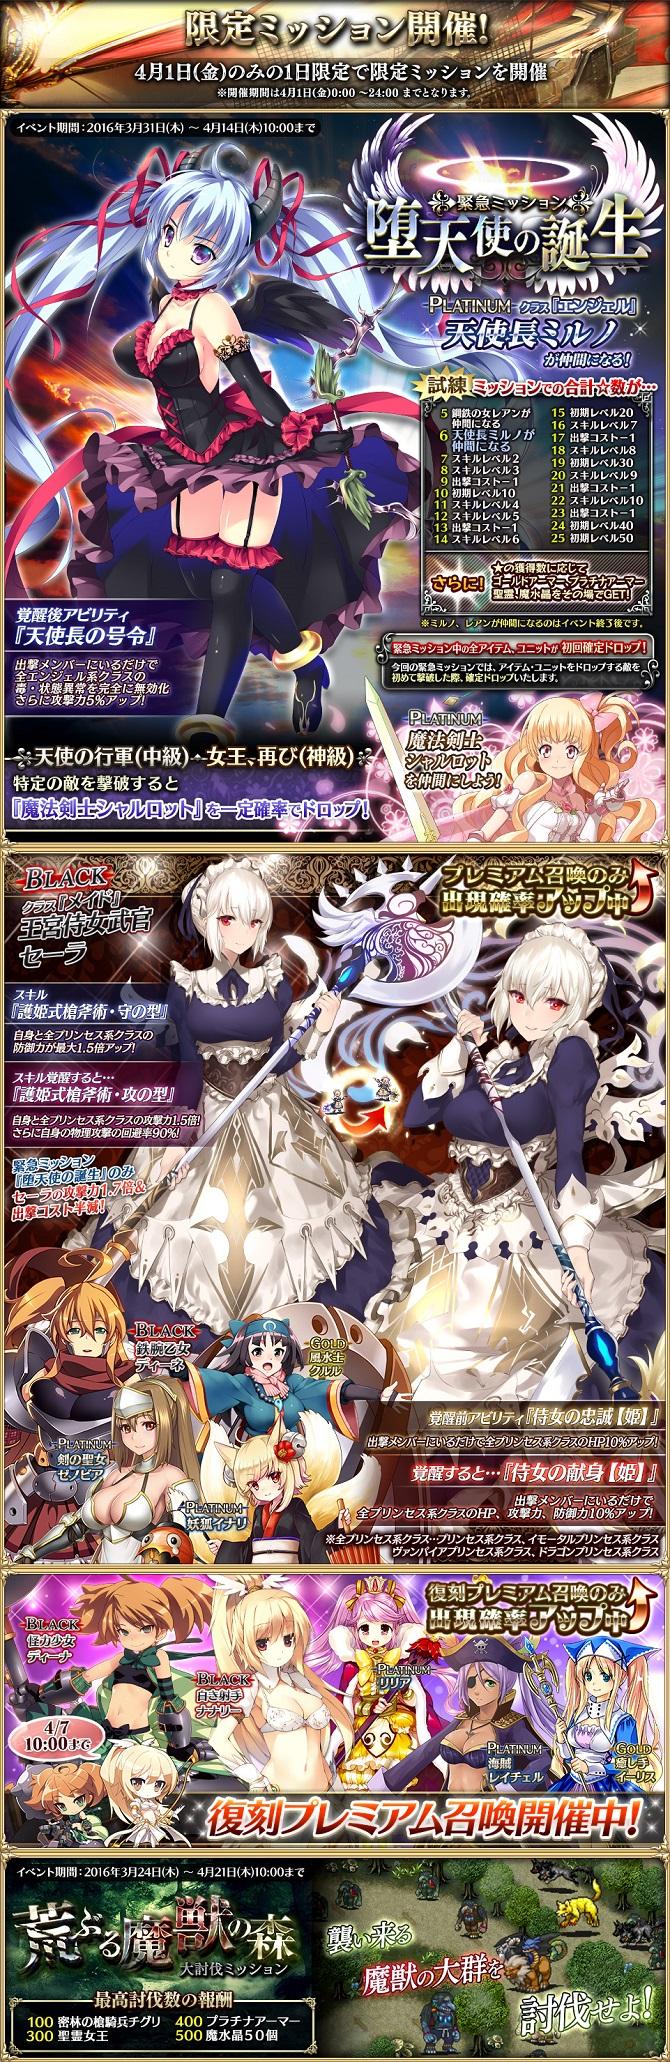 Fallen Angel's Birth